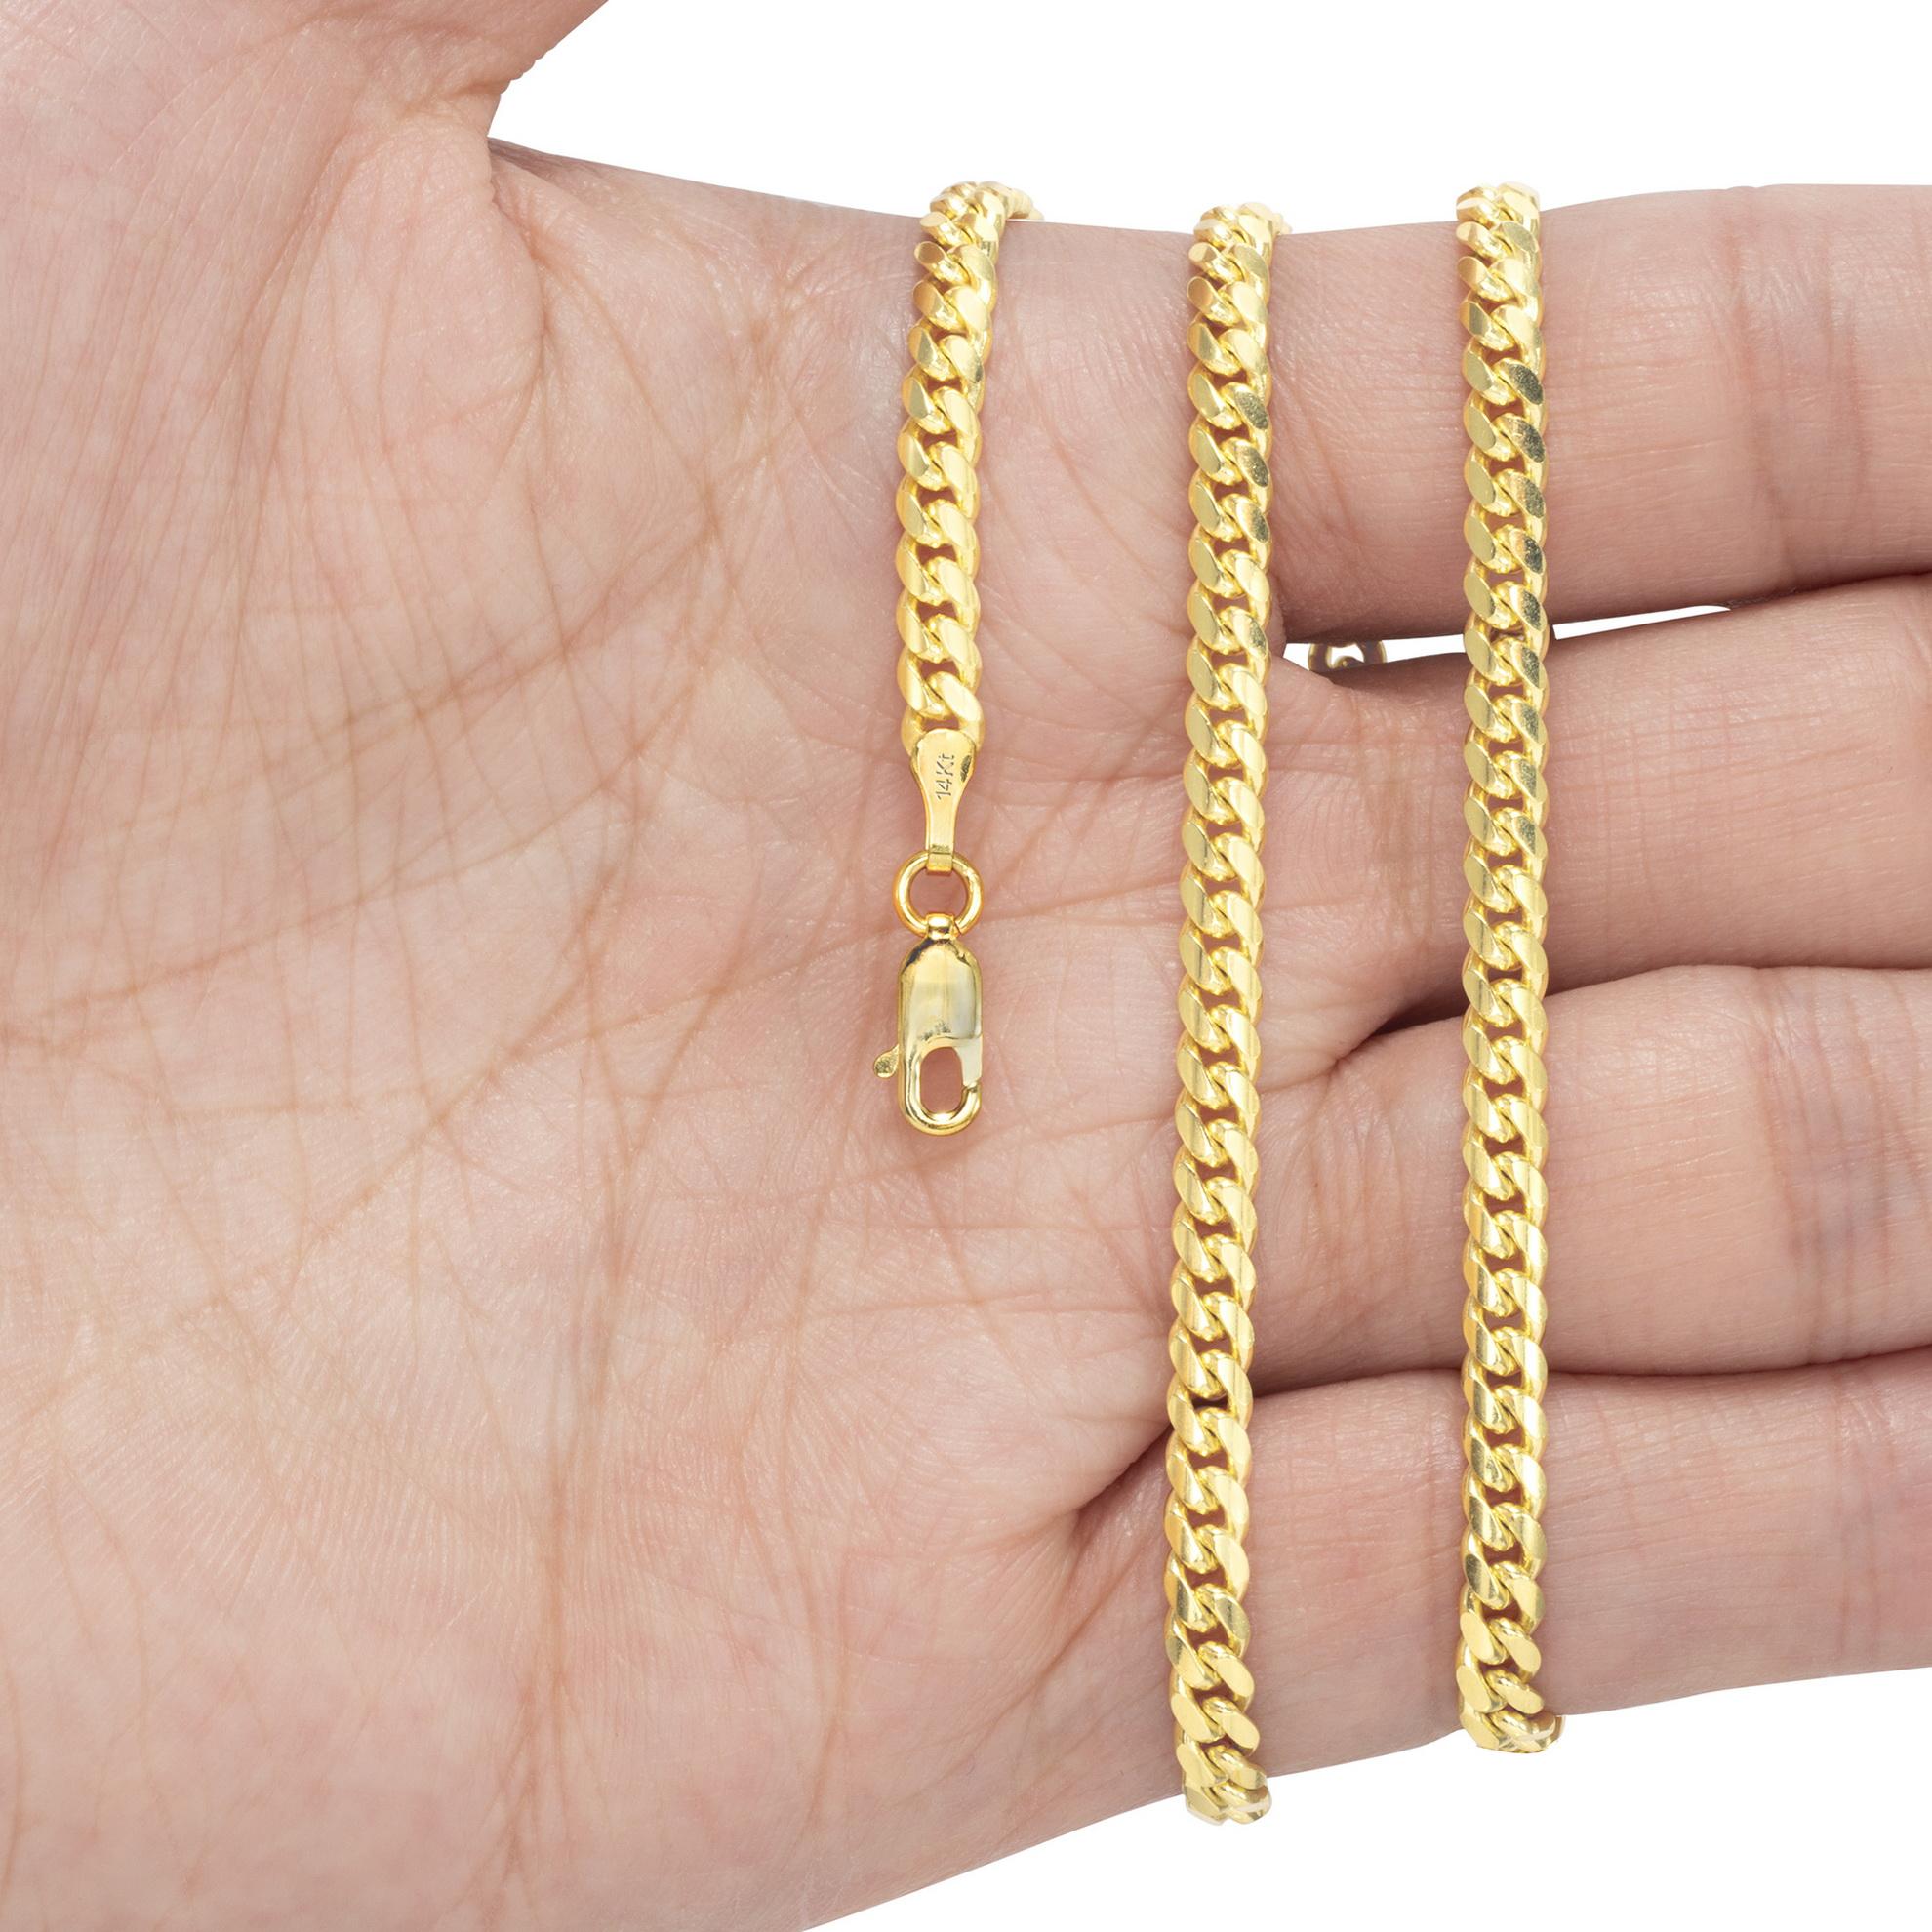 14K-Yellow-Gold-Solid-2-7mm-11mm-Miami-Cuban-Link-Chain-Bracelet-Men-Women-7-034-9-034 thumbnail 17